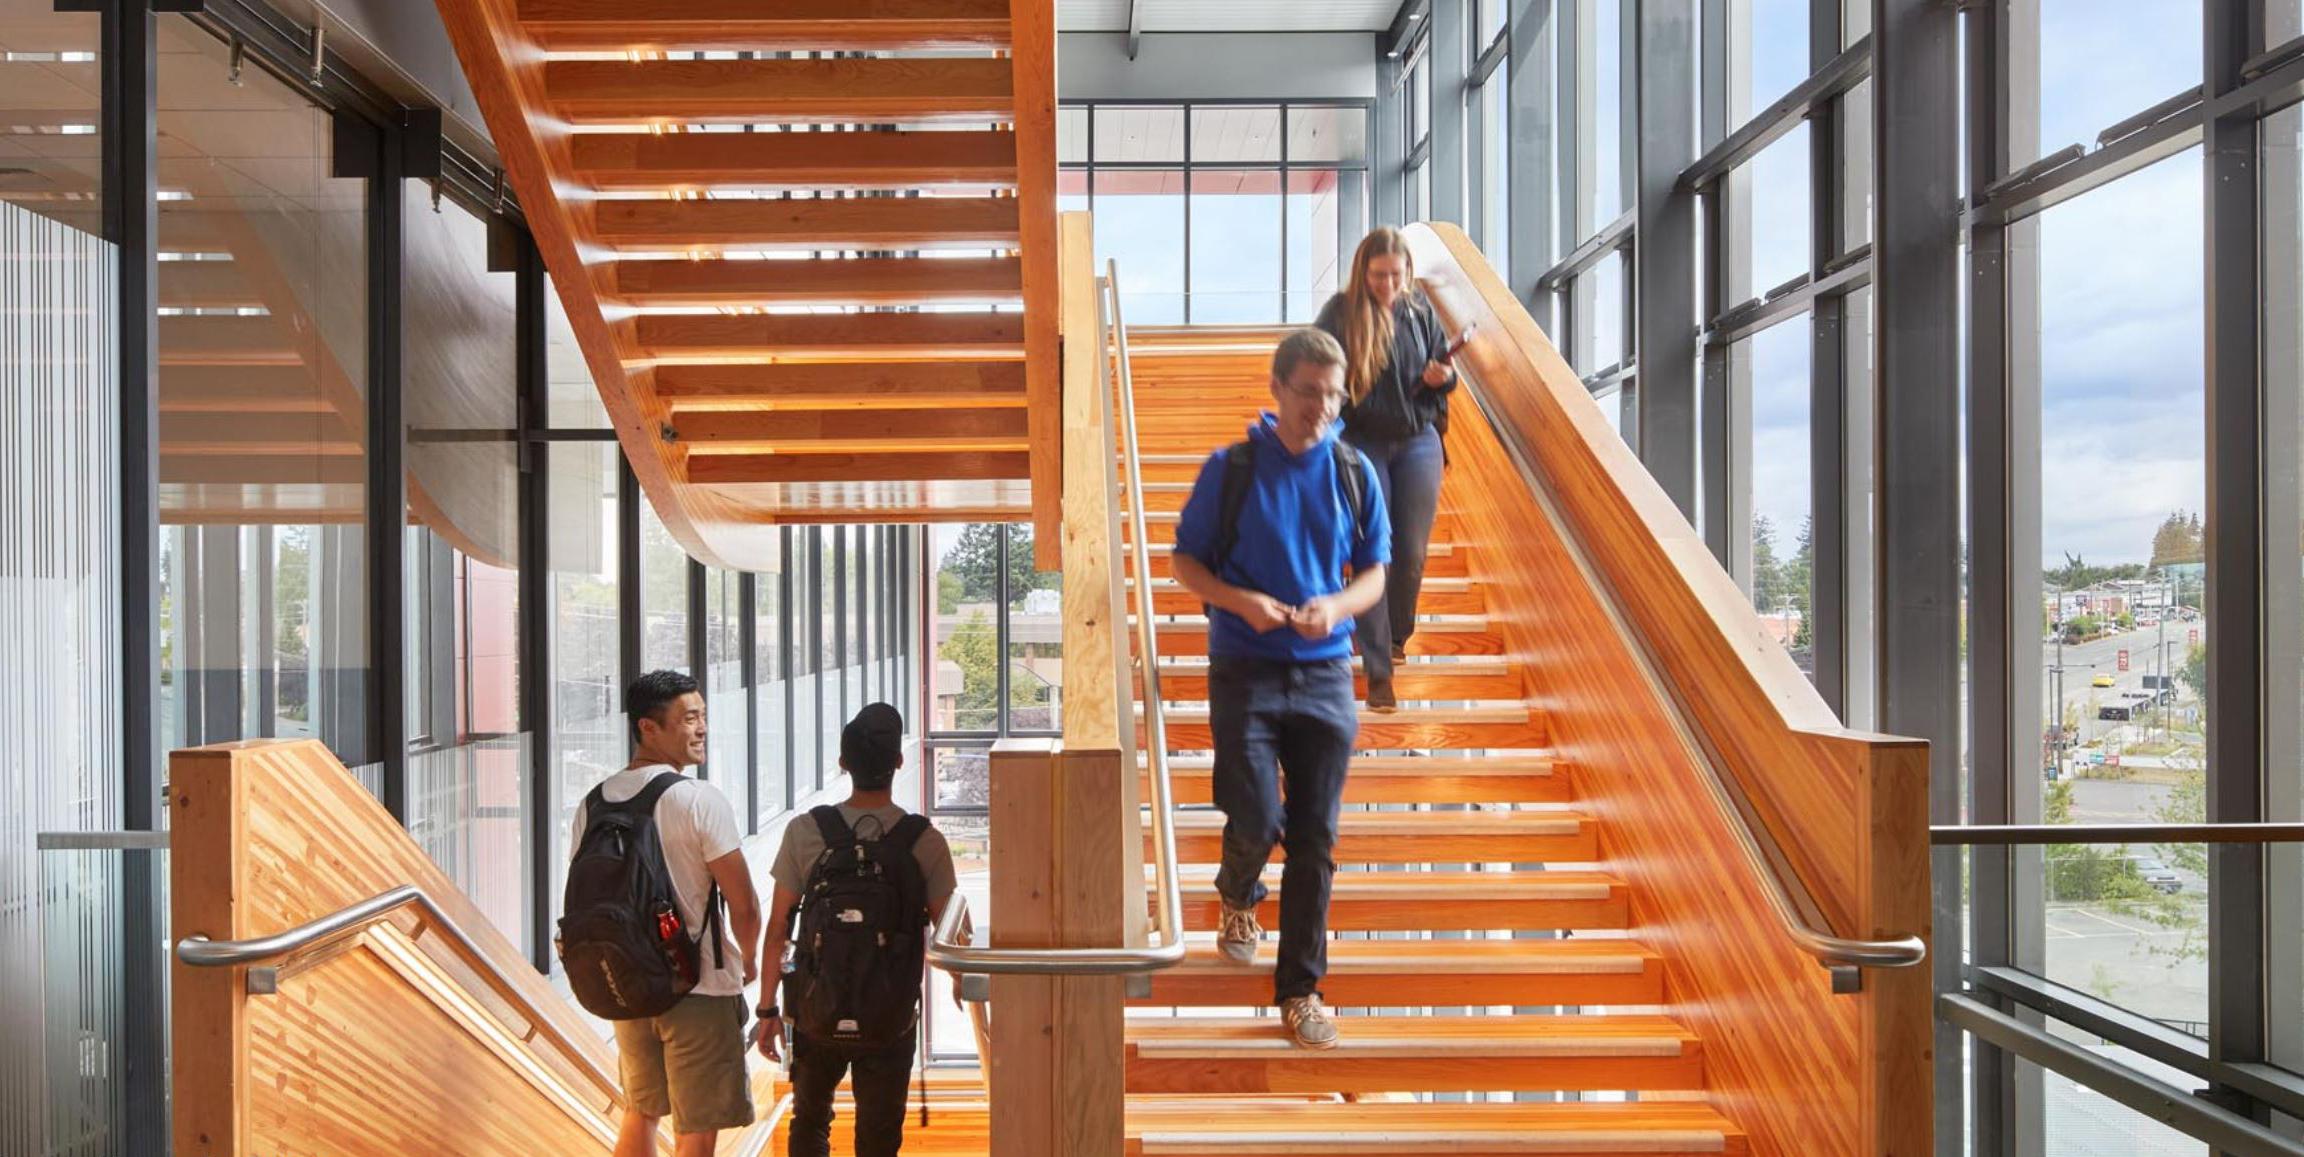 WSU Academic Center, Everett, WA